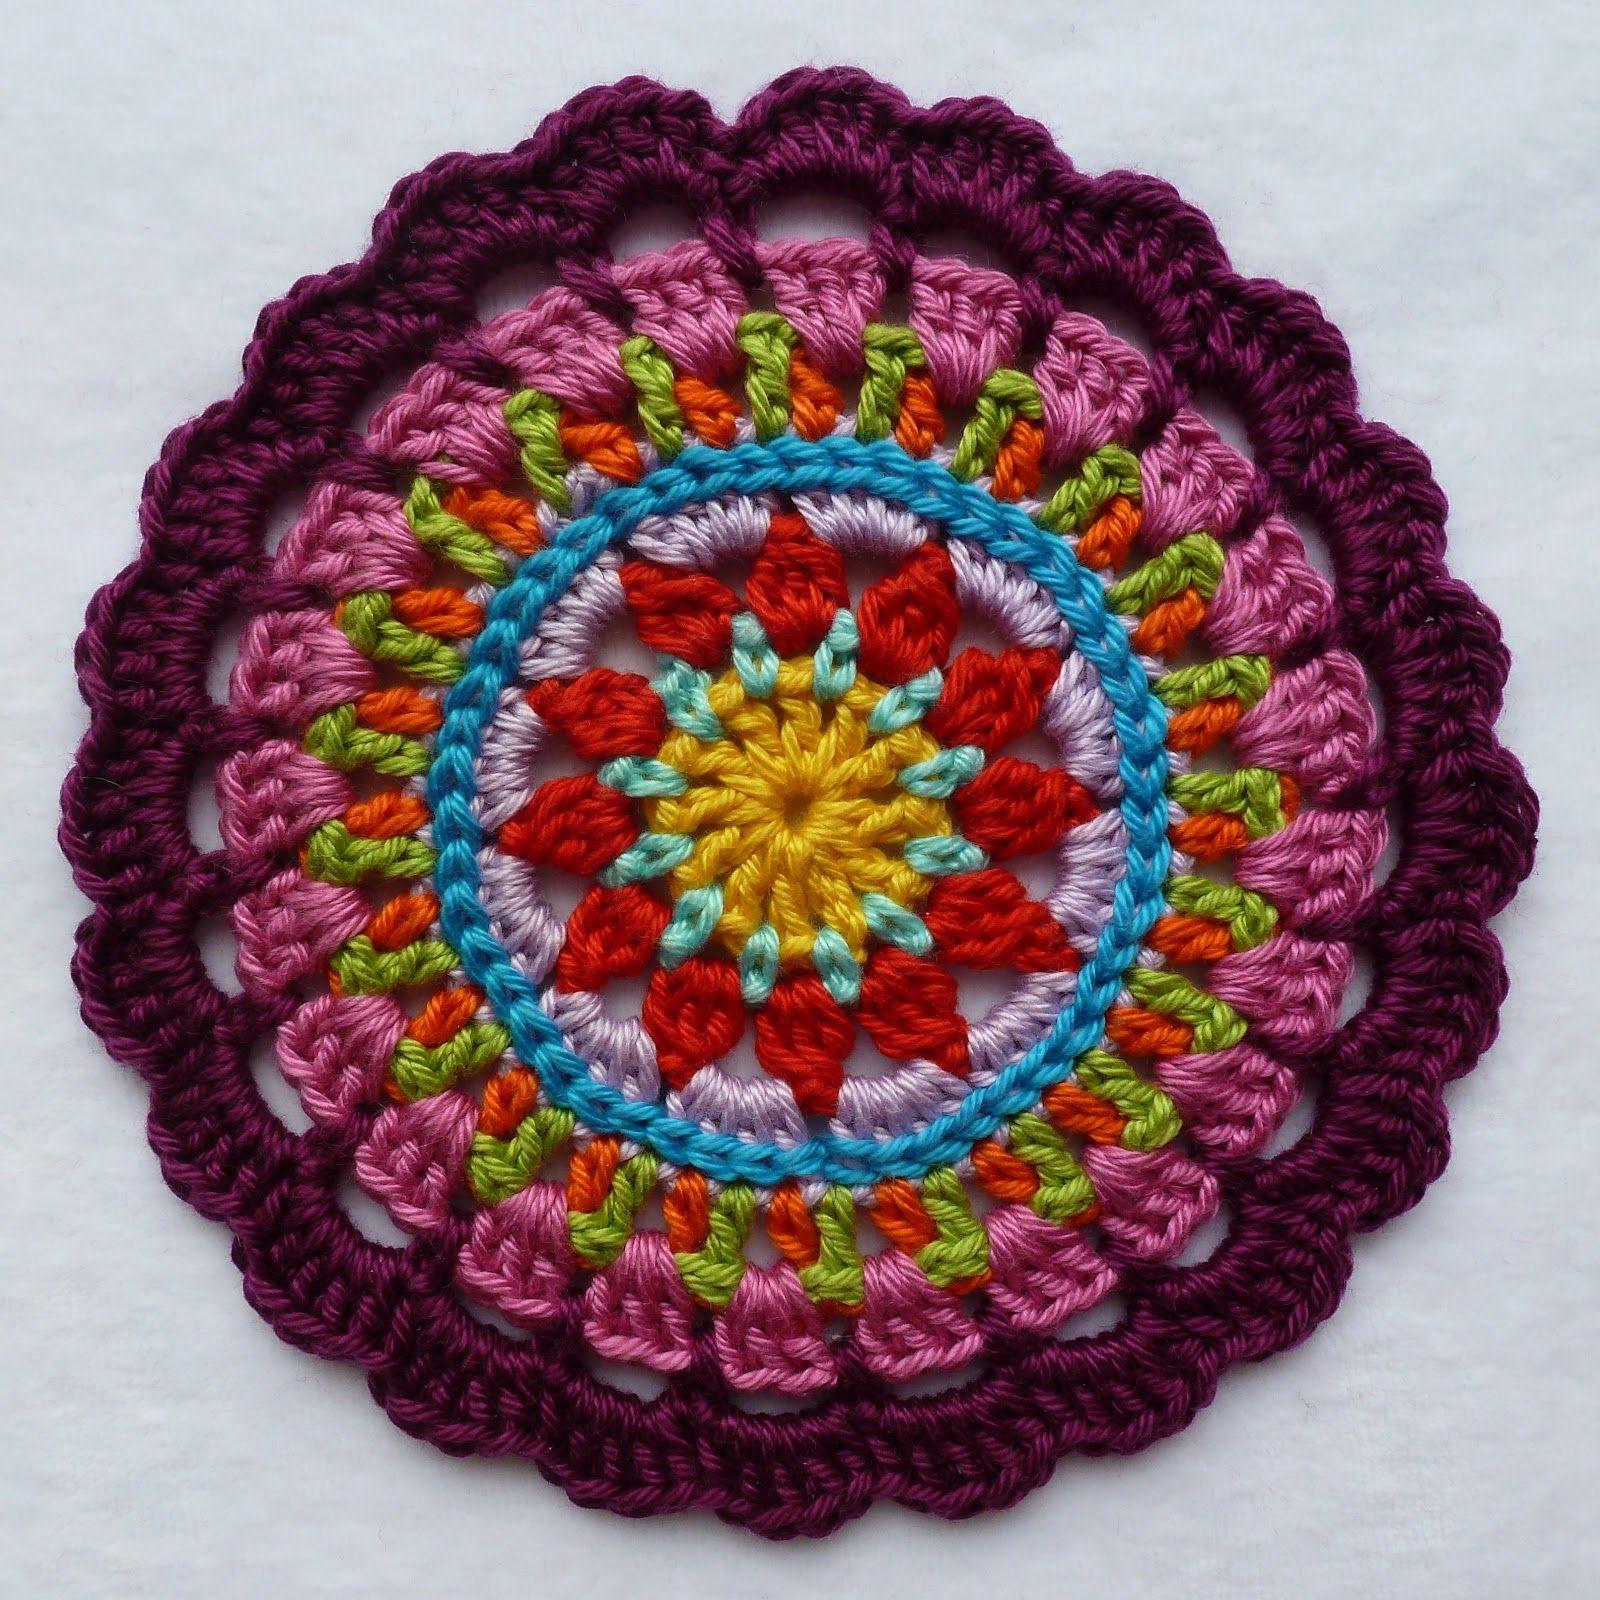 3.JPG 1,600×1,600 pixels   Crochet   Pinterest   Häkeln